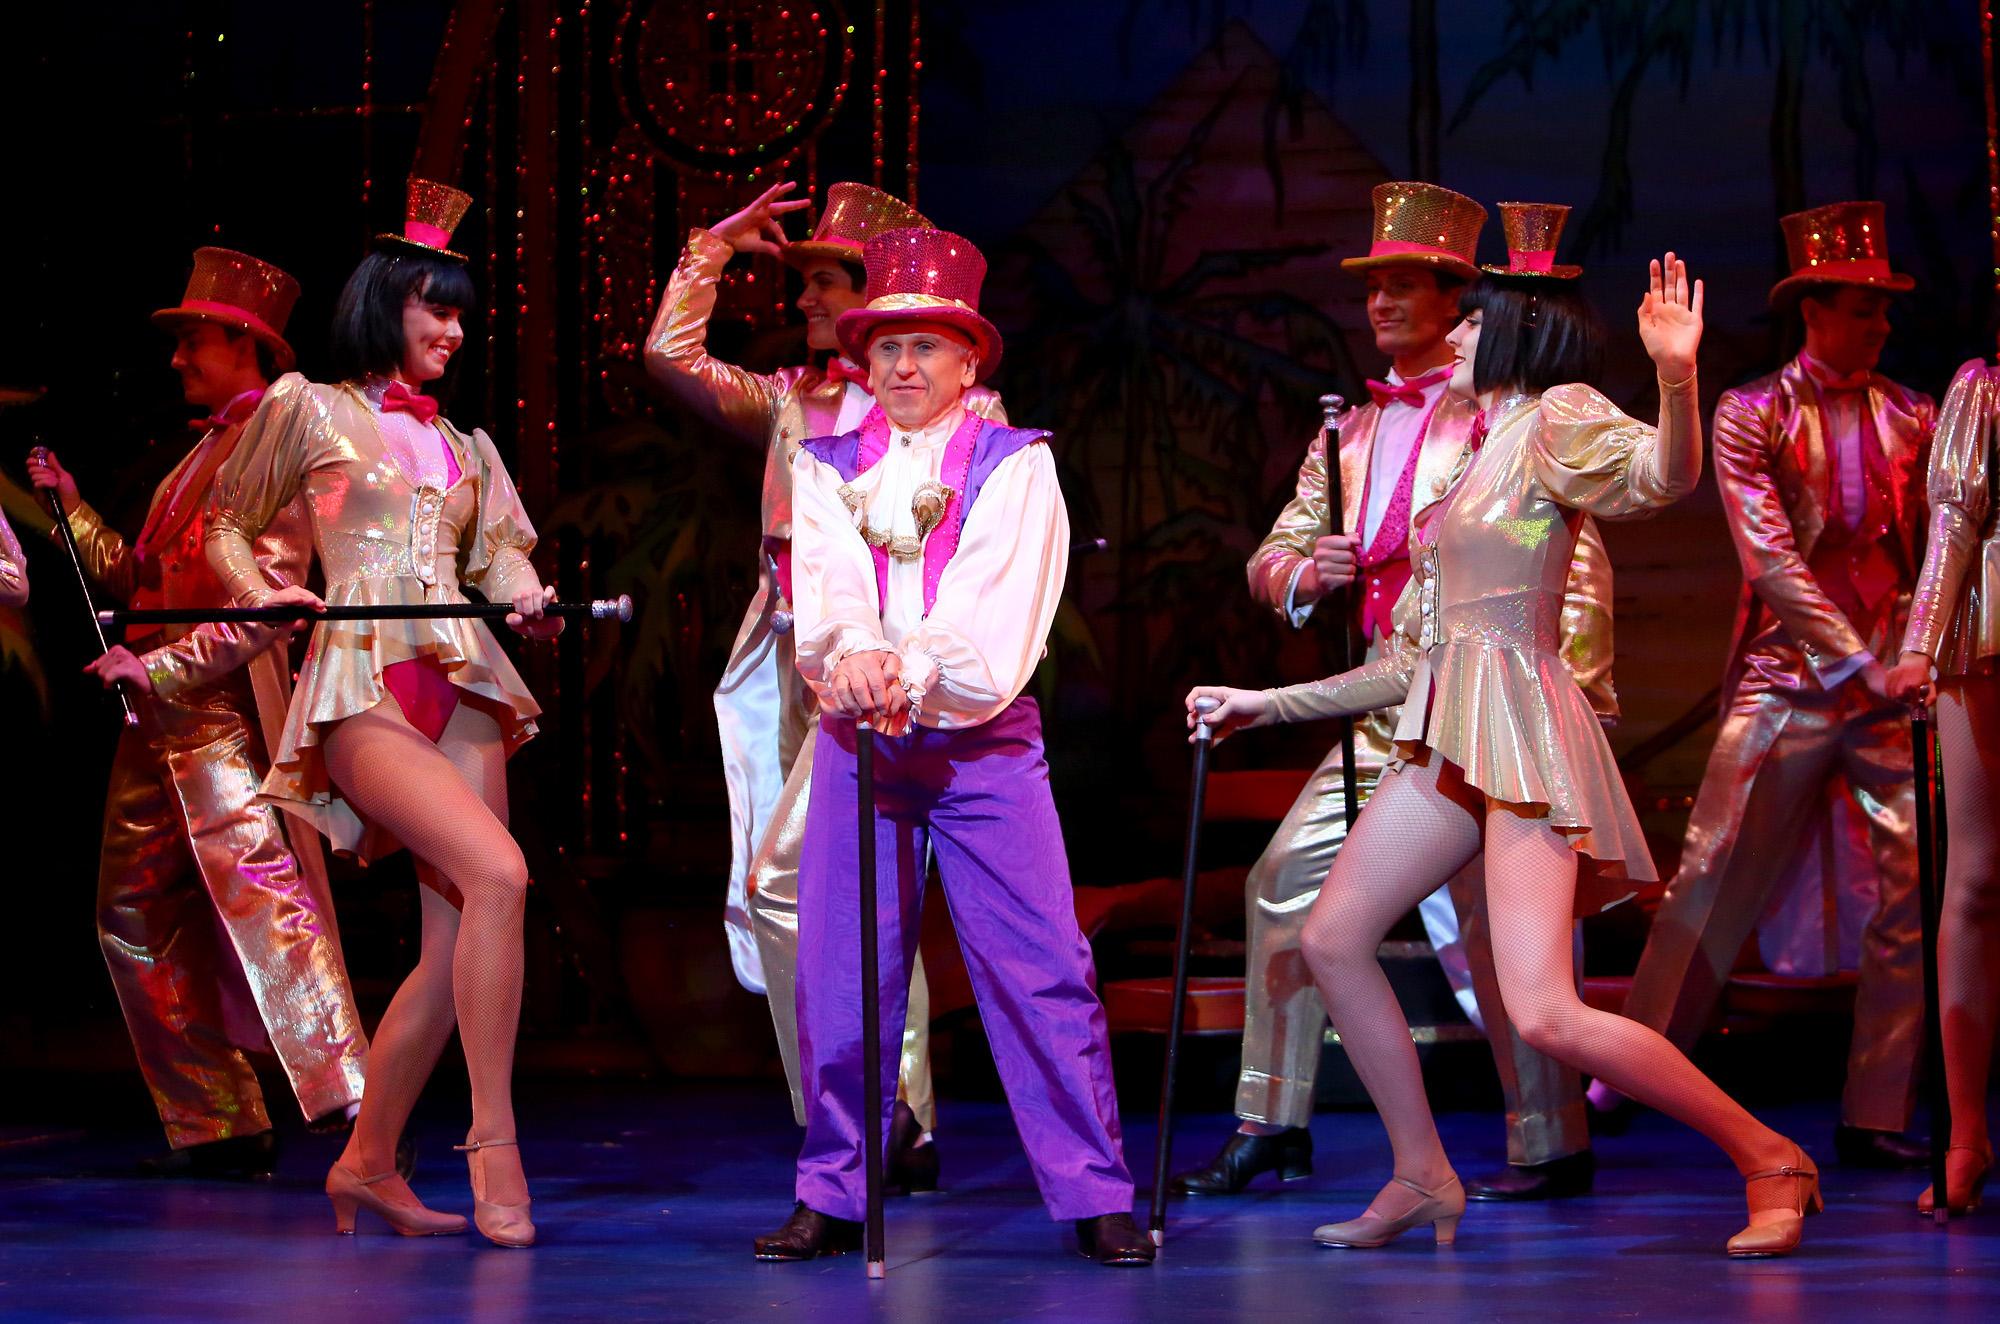 Aladdin. Wayne Sleep. Milton Keynes Theatre pantomime, Christmas 2015. Aladdin stars Priscilla Presley, Gary Wilmot, Ben Adams, Wayne Sleep, Kev Orkian, Mark Pickering, Aimie Atkinson and Phil Holden.